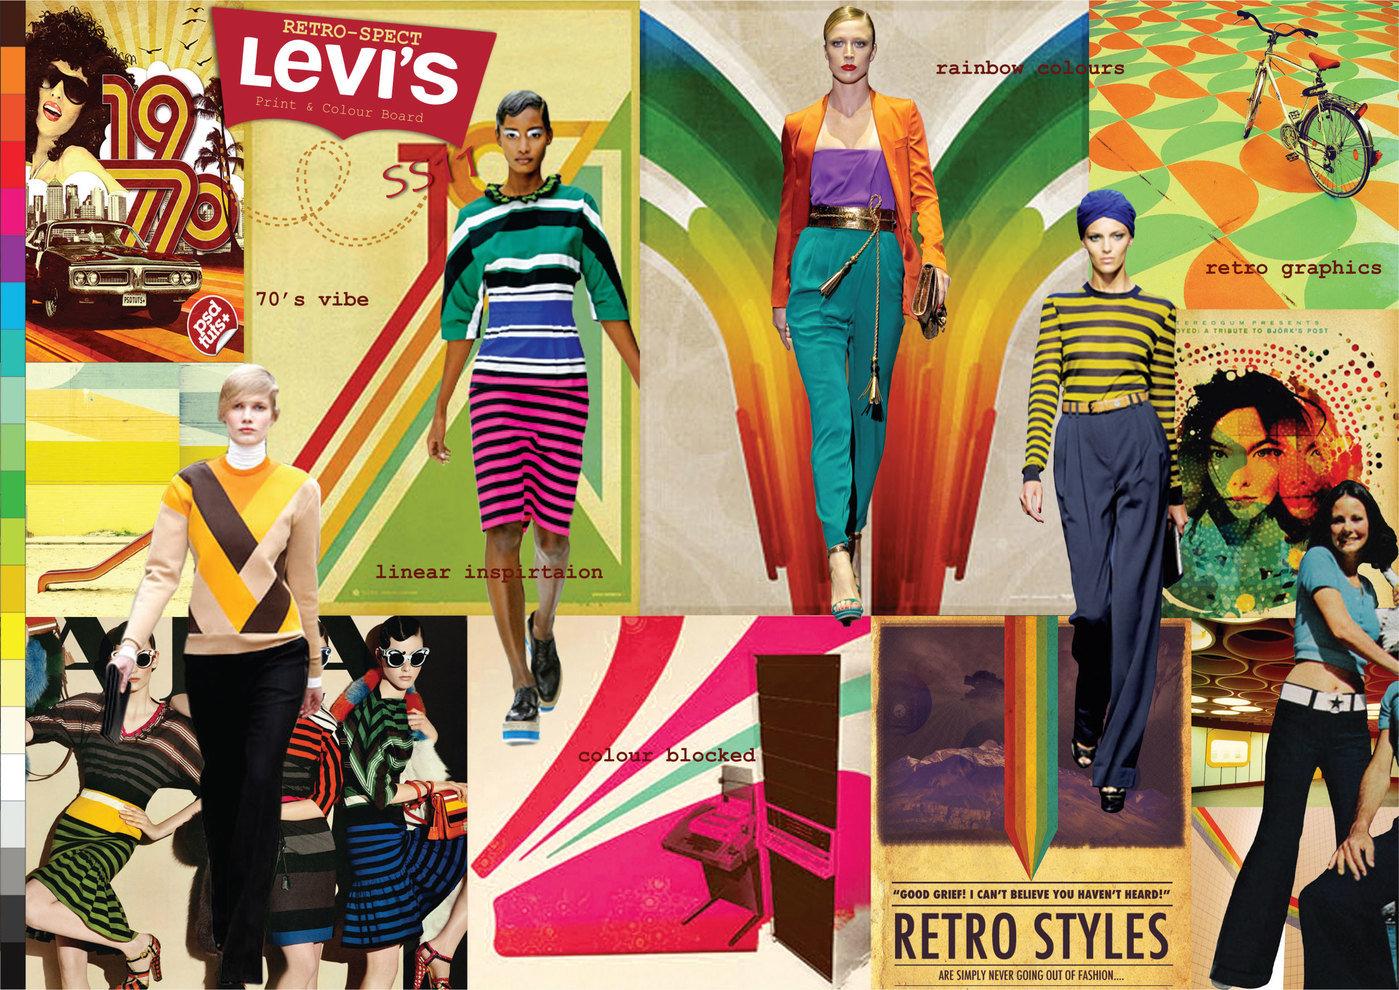 Levis Ss11 Portfolio Project Retro Spect By Amrita Pais At Coroflot Com